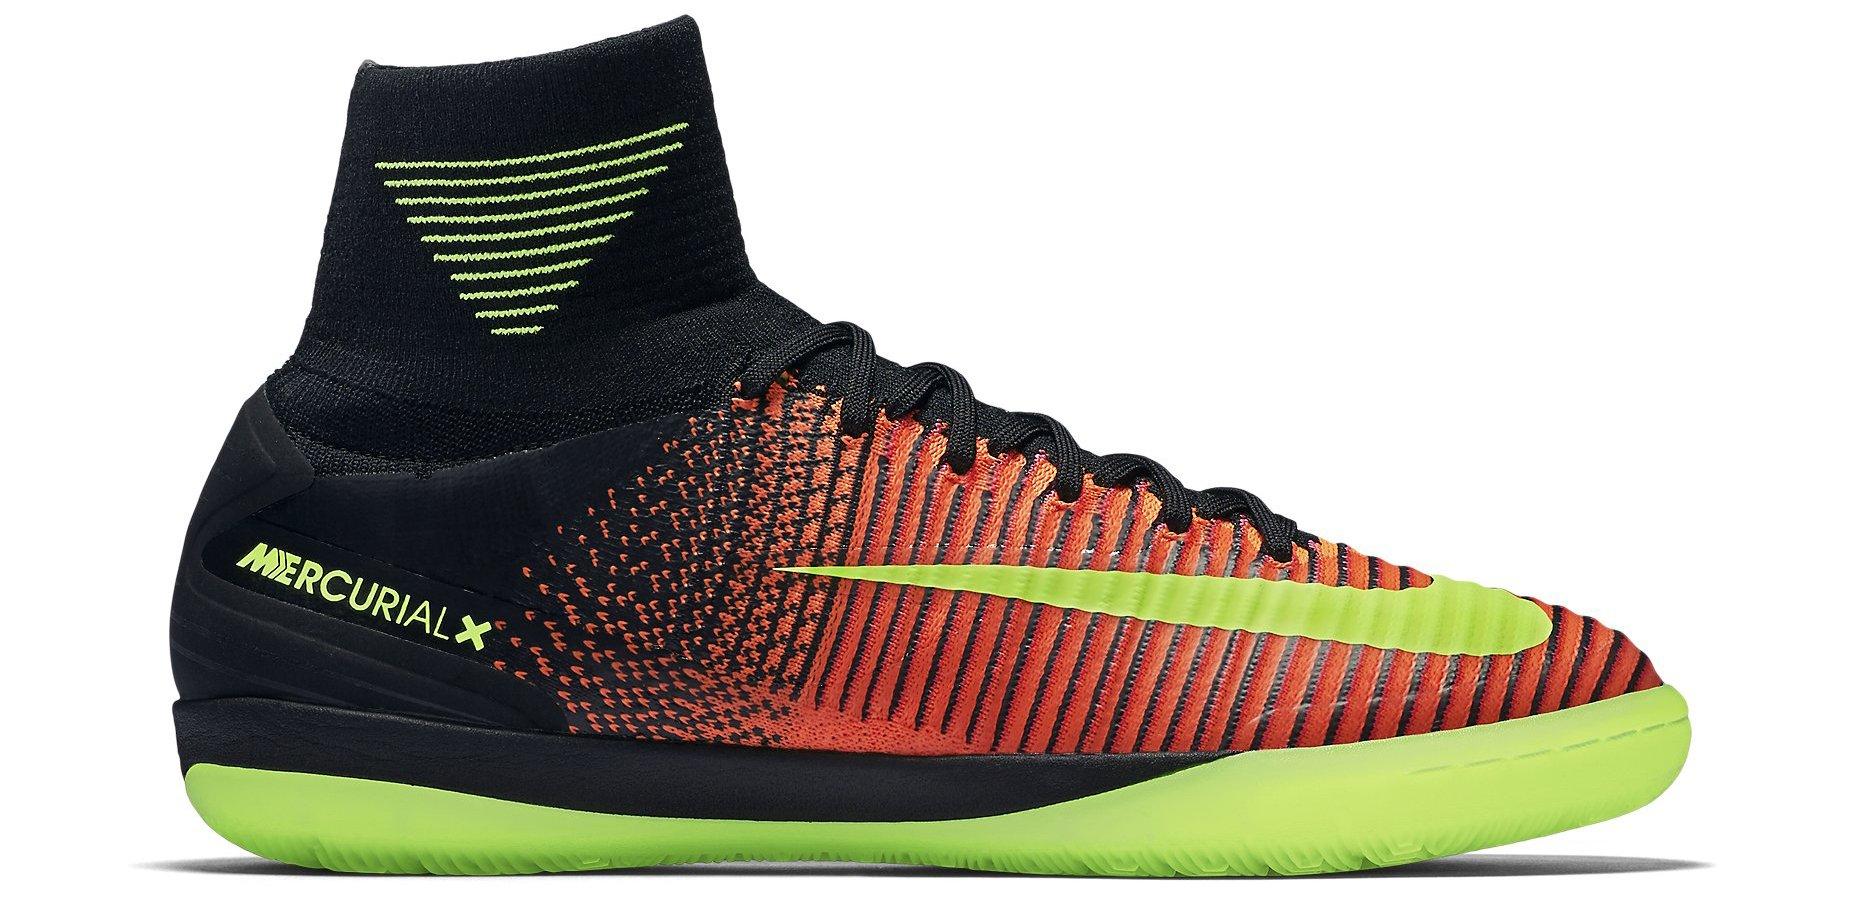 Sálovky Nike MercurialX Proximo II IC